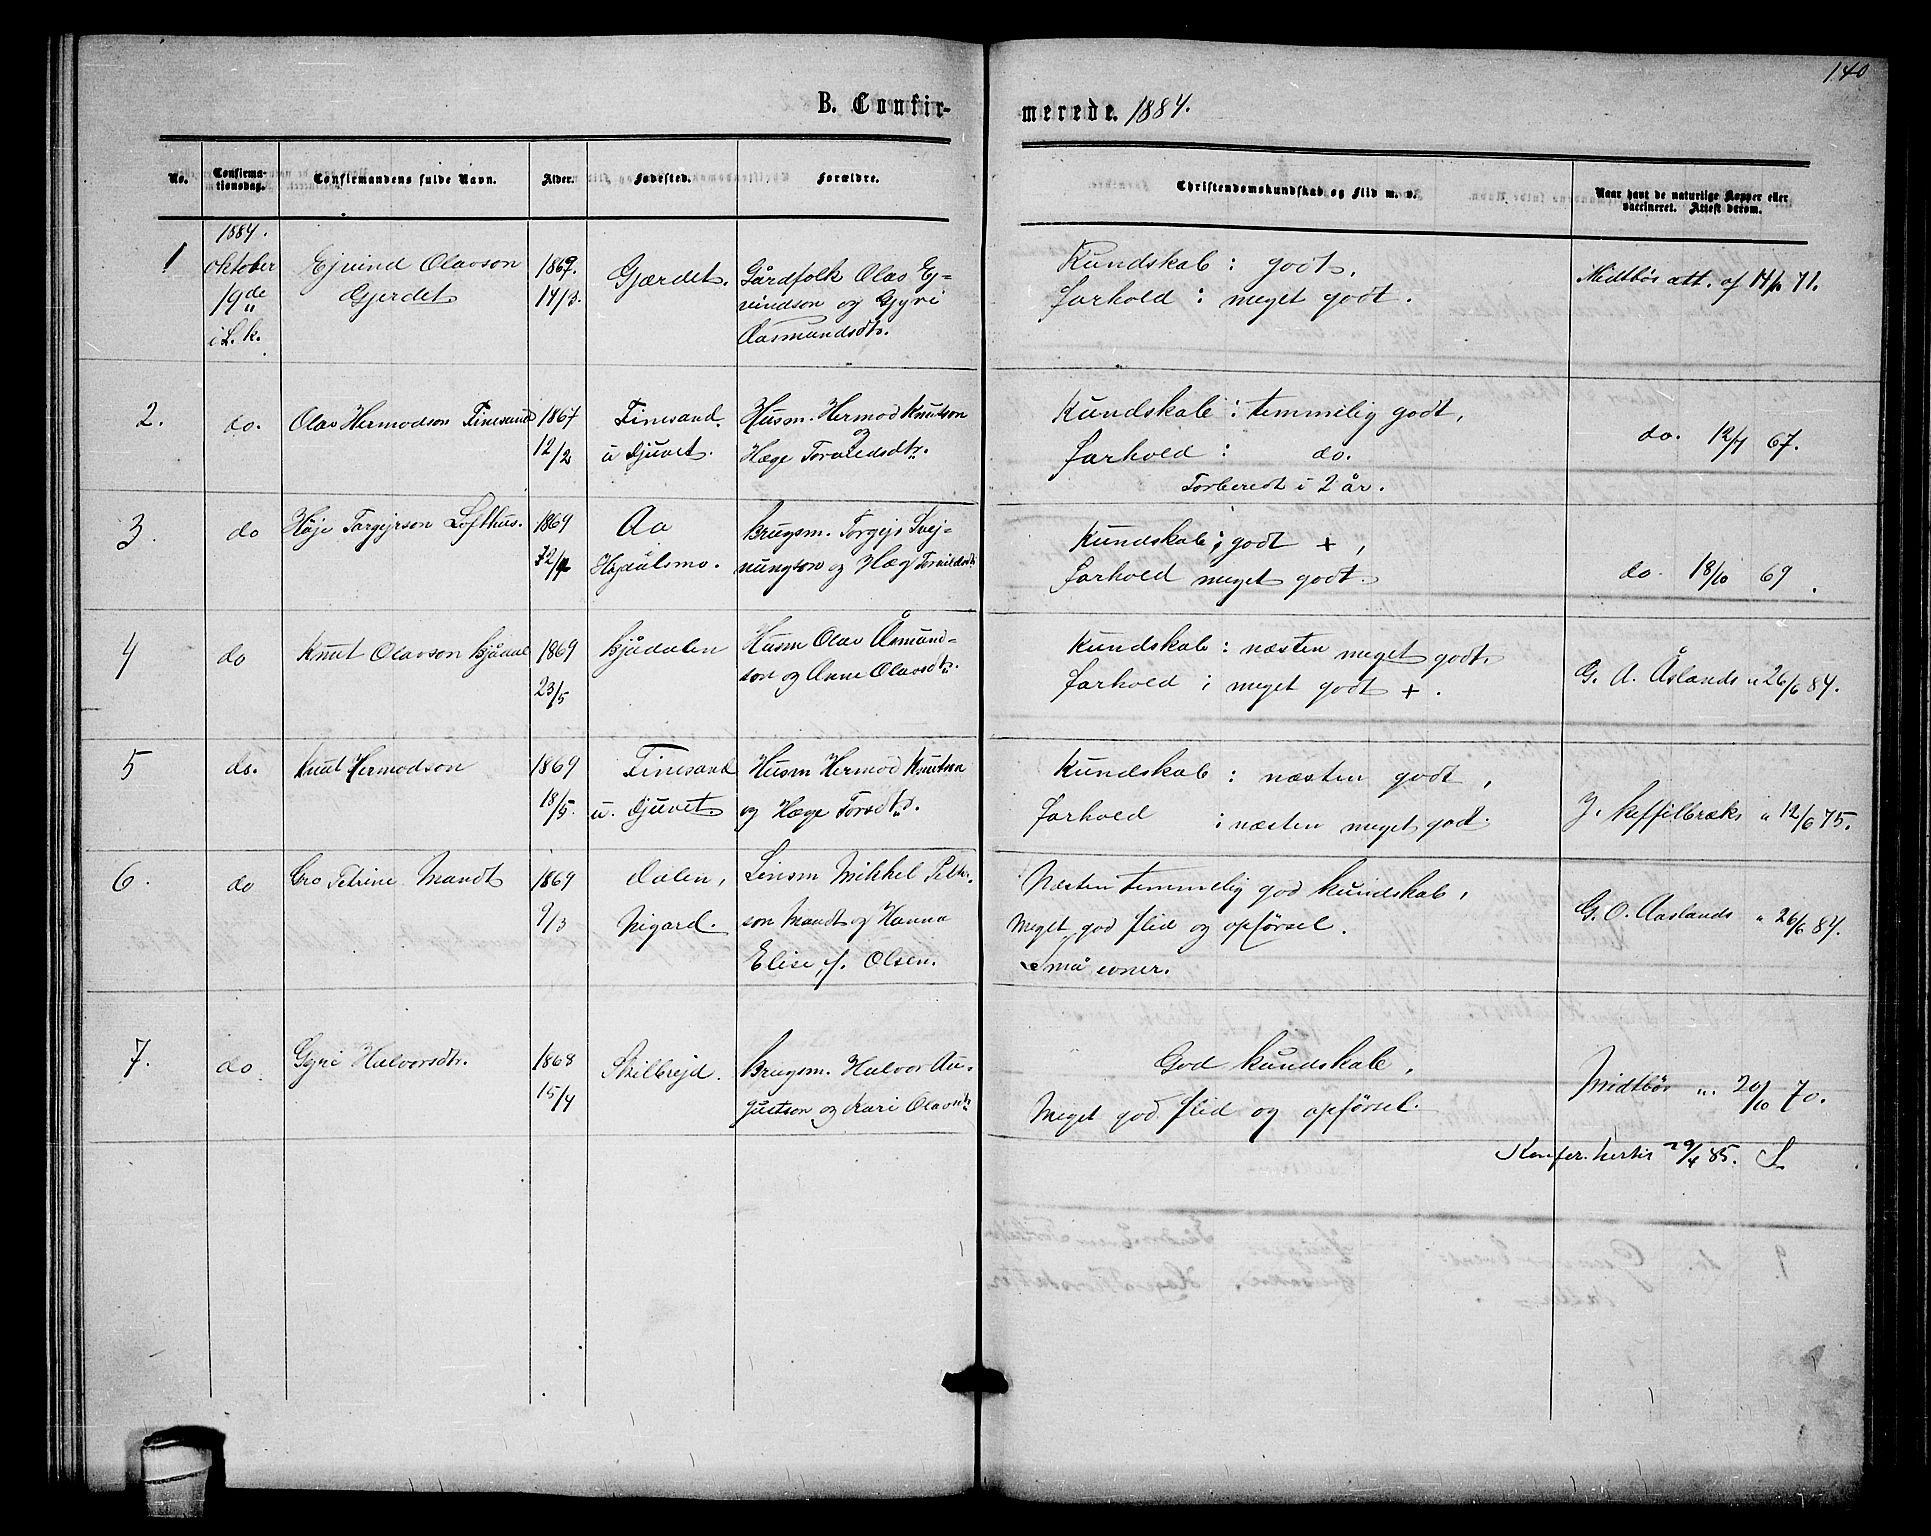 SAKO, Lårdal kirkebøker, G/Gb/L0002: Klokkerbok nr. II 2, 1865-1888, s. 140